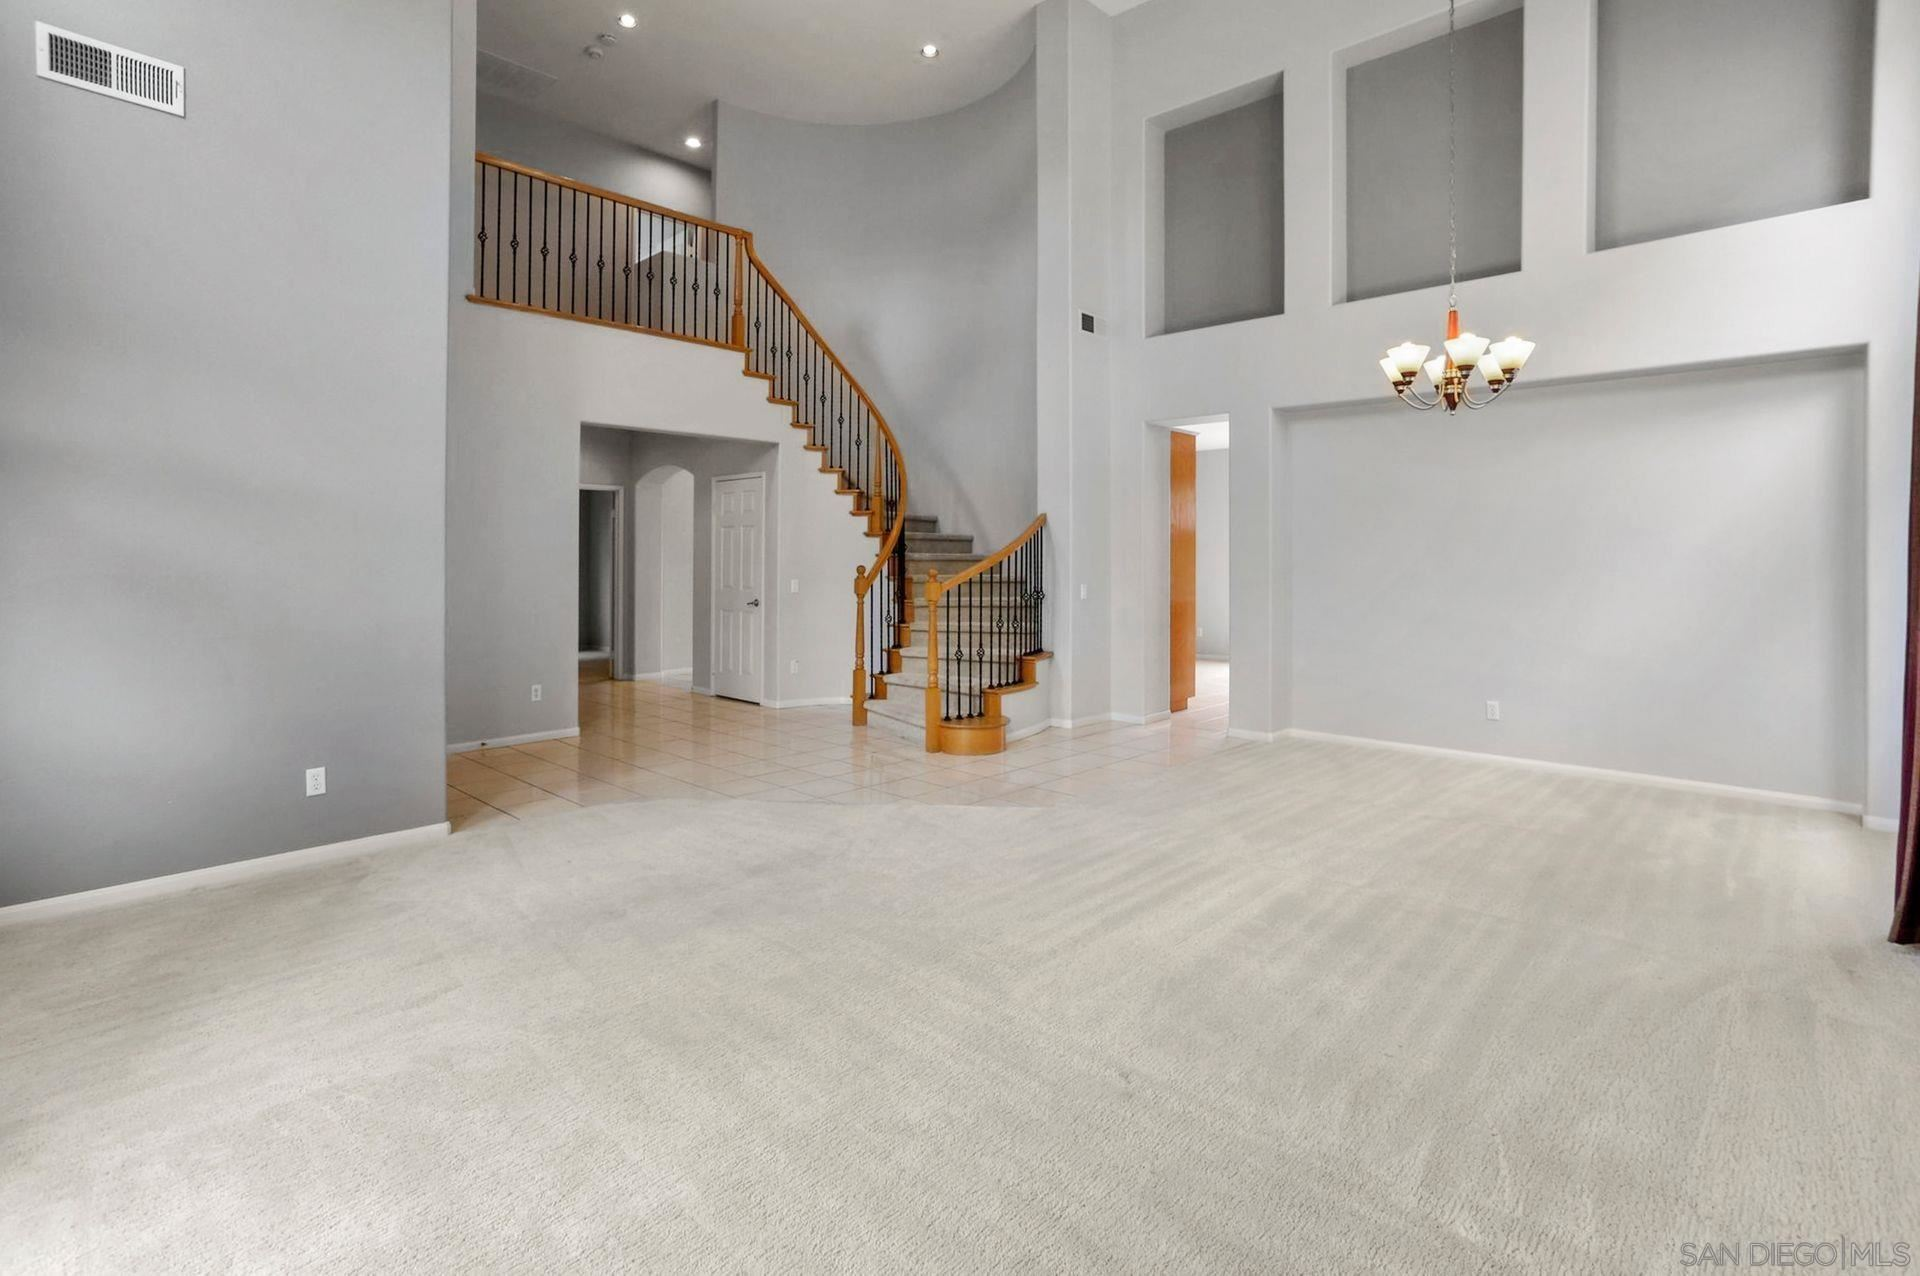 1937 Lagrange Rd, Chula Vista, CA 91913 - MLS#: 210027577